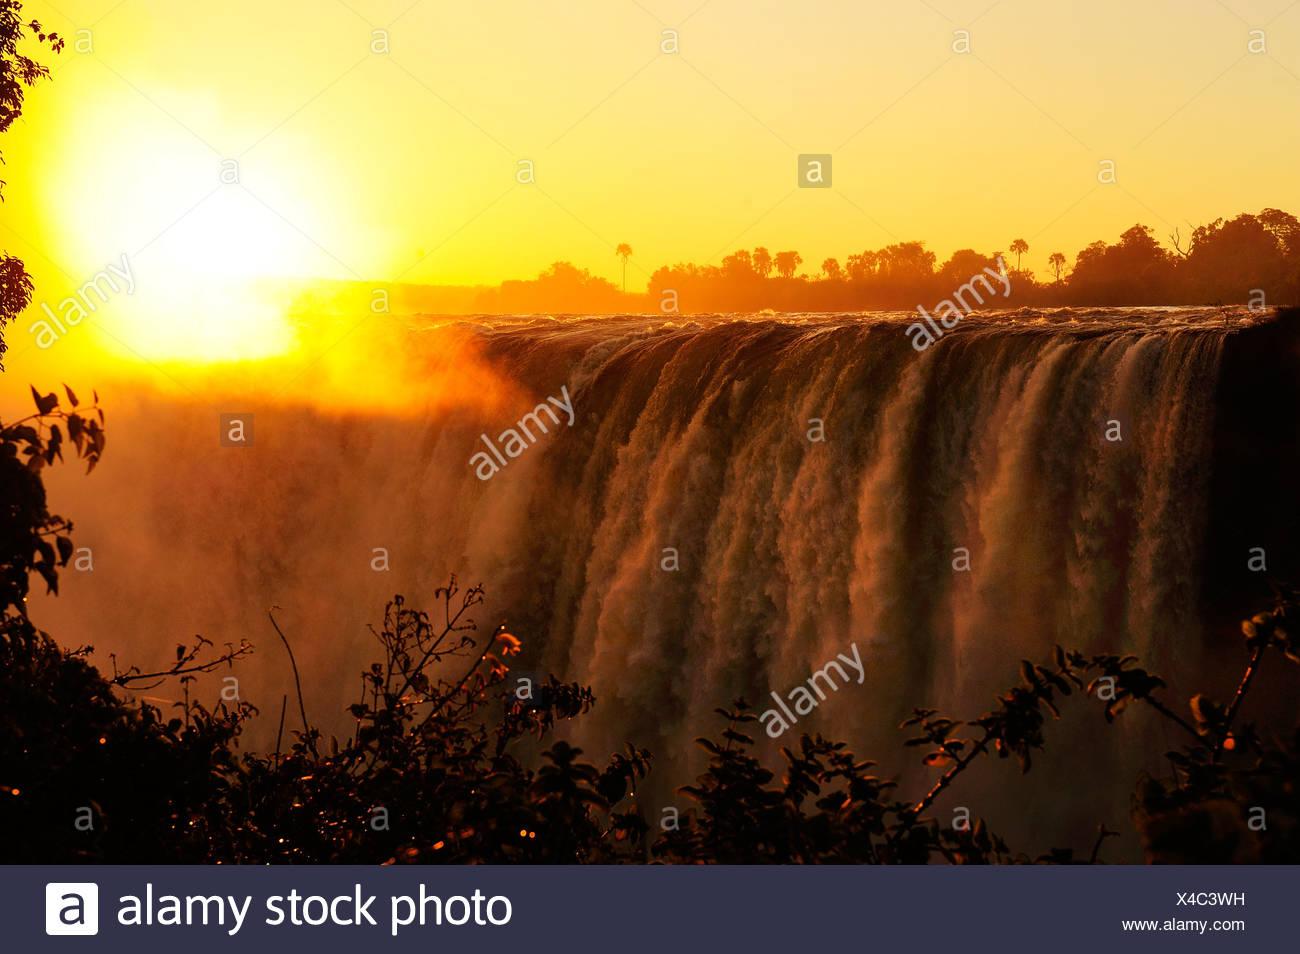 Africa, Zimbabwe, Zambezi River, Sud Africa, Victoria Falls, cascata, acqua, canyon, gorge, sun, tramonto Immagini Stock